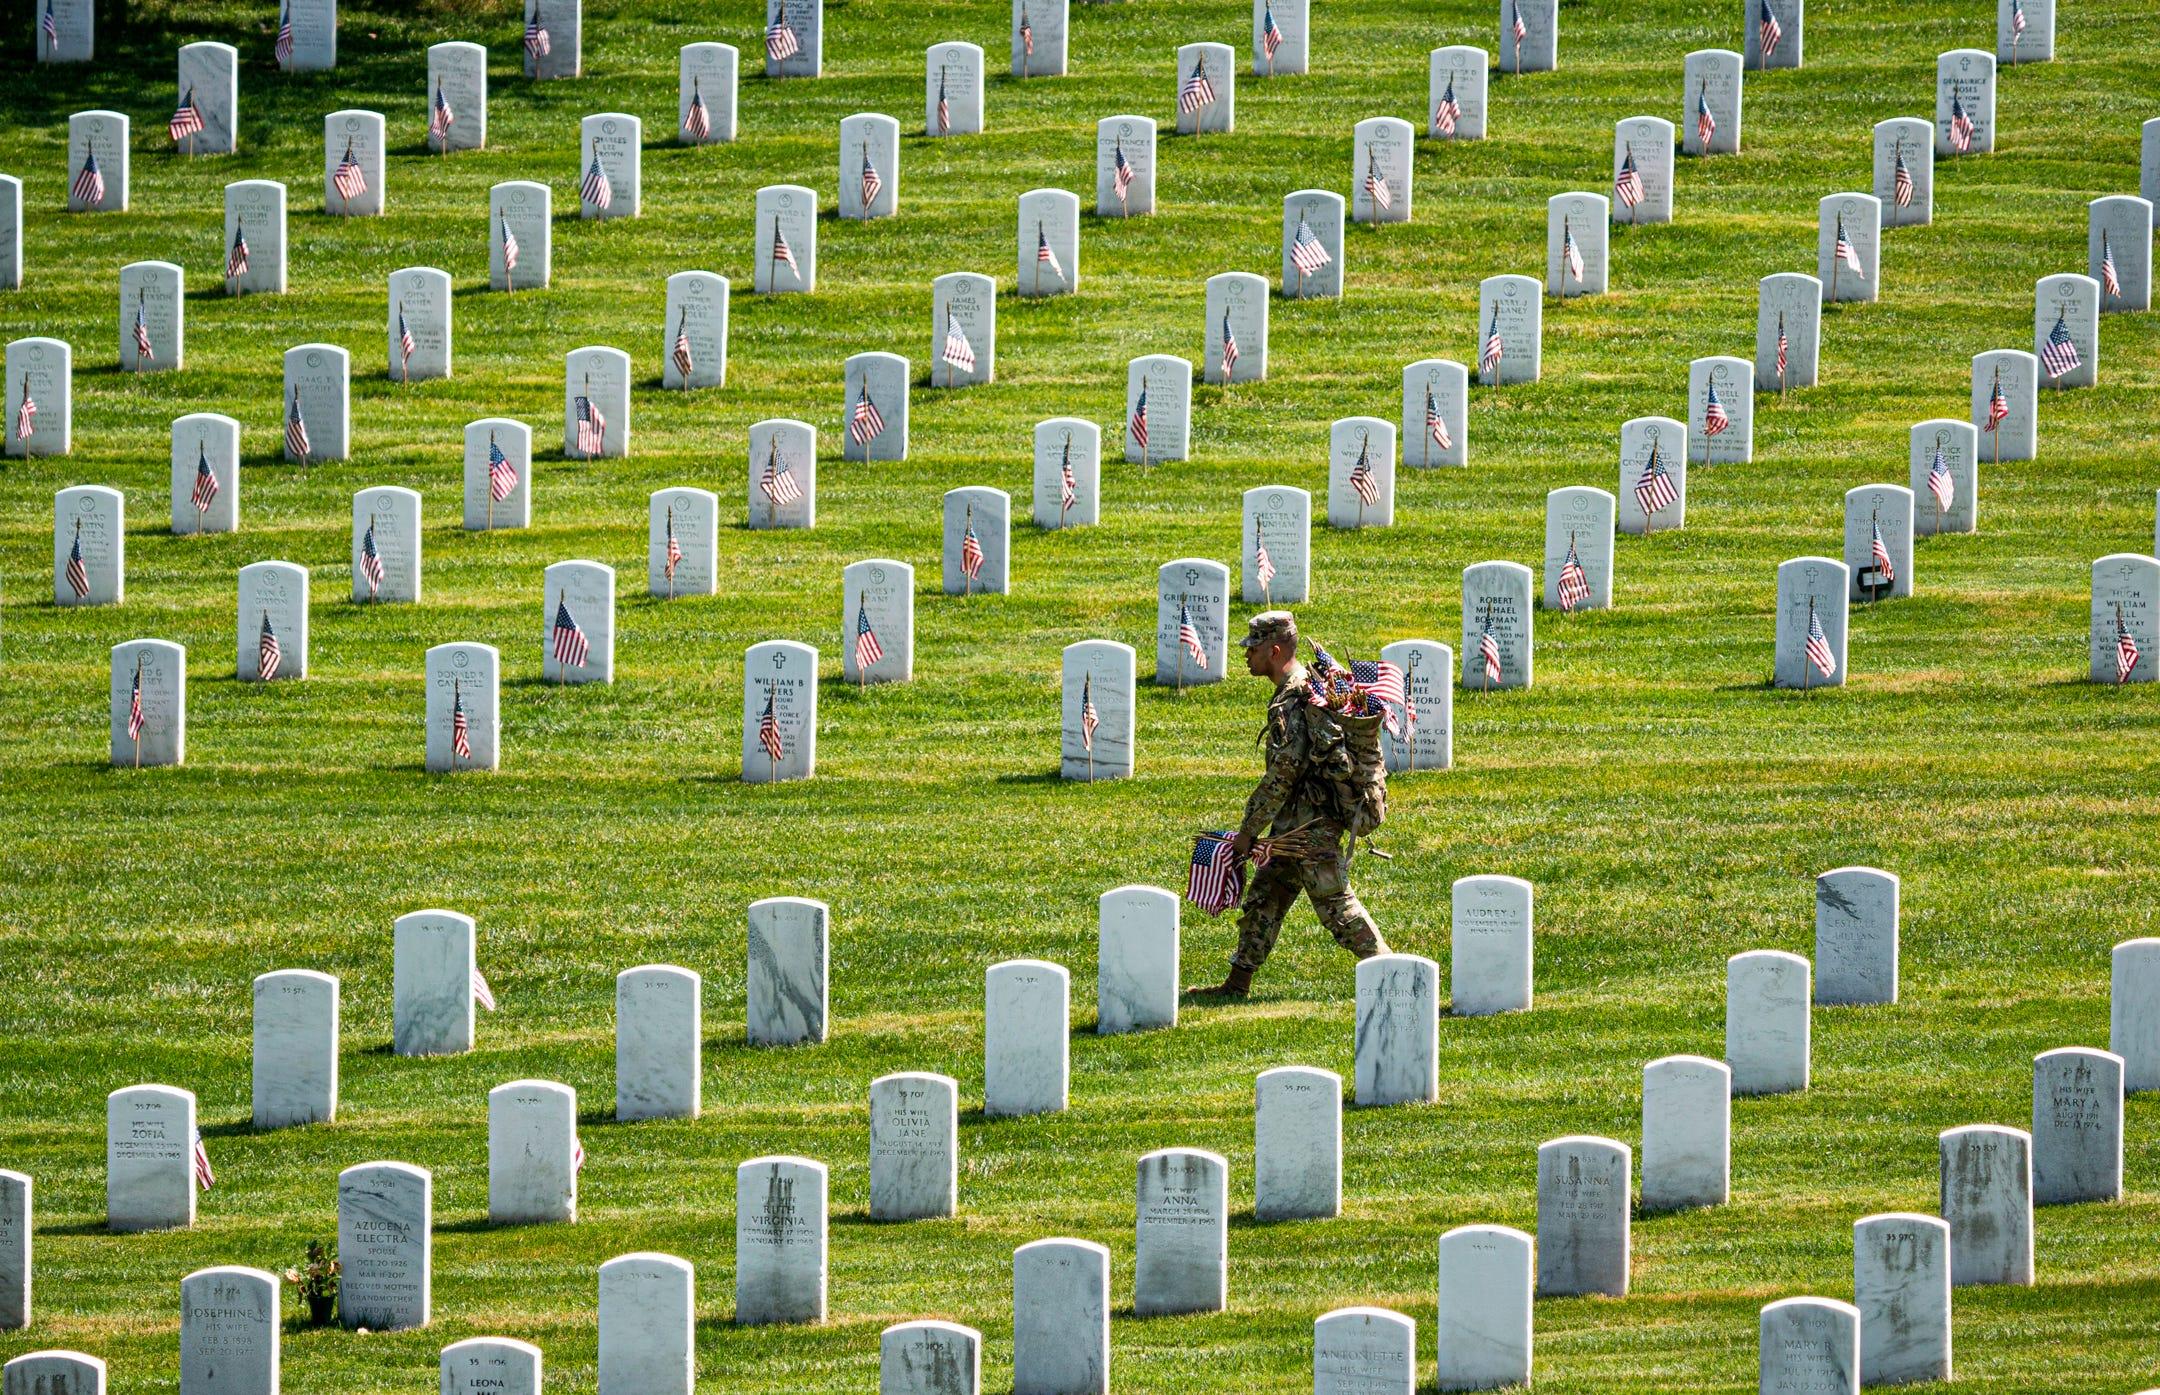 Photos: Arlington National Cemetery 'Flags In' for Memorial Day